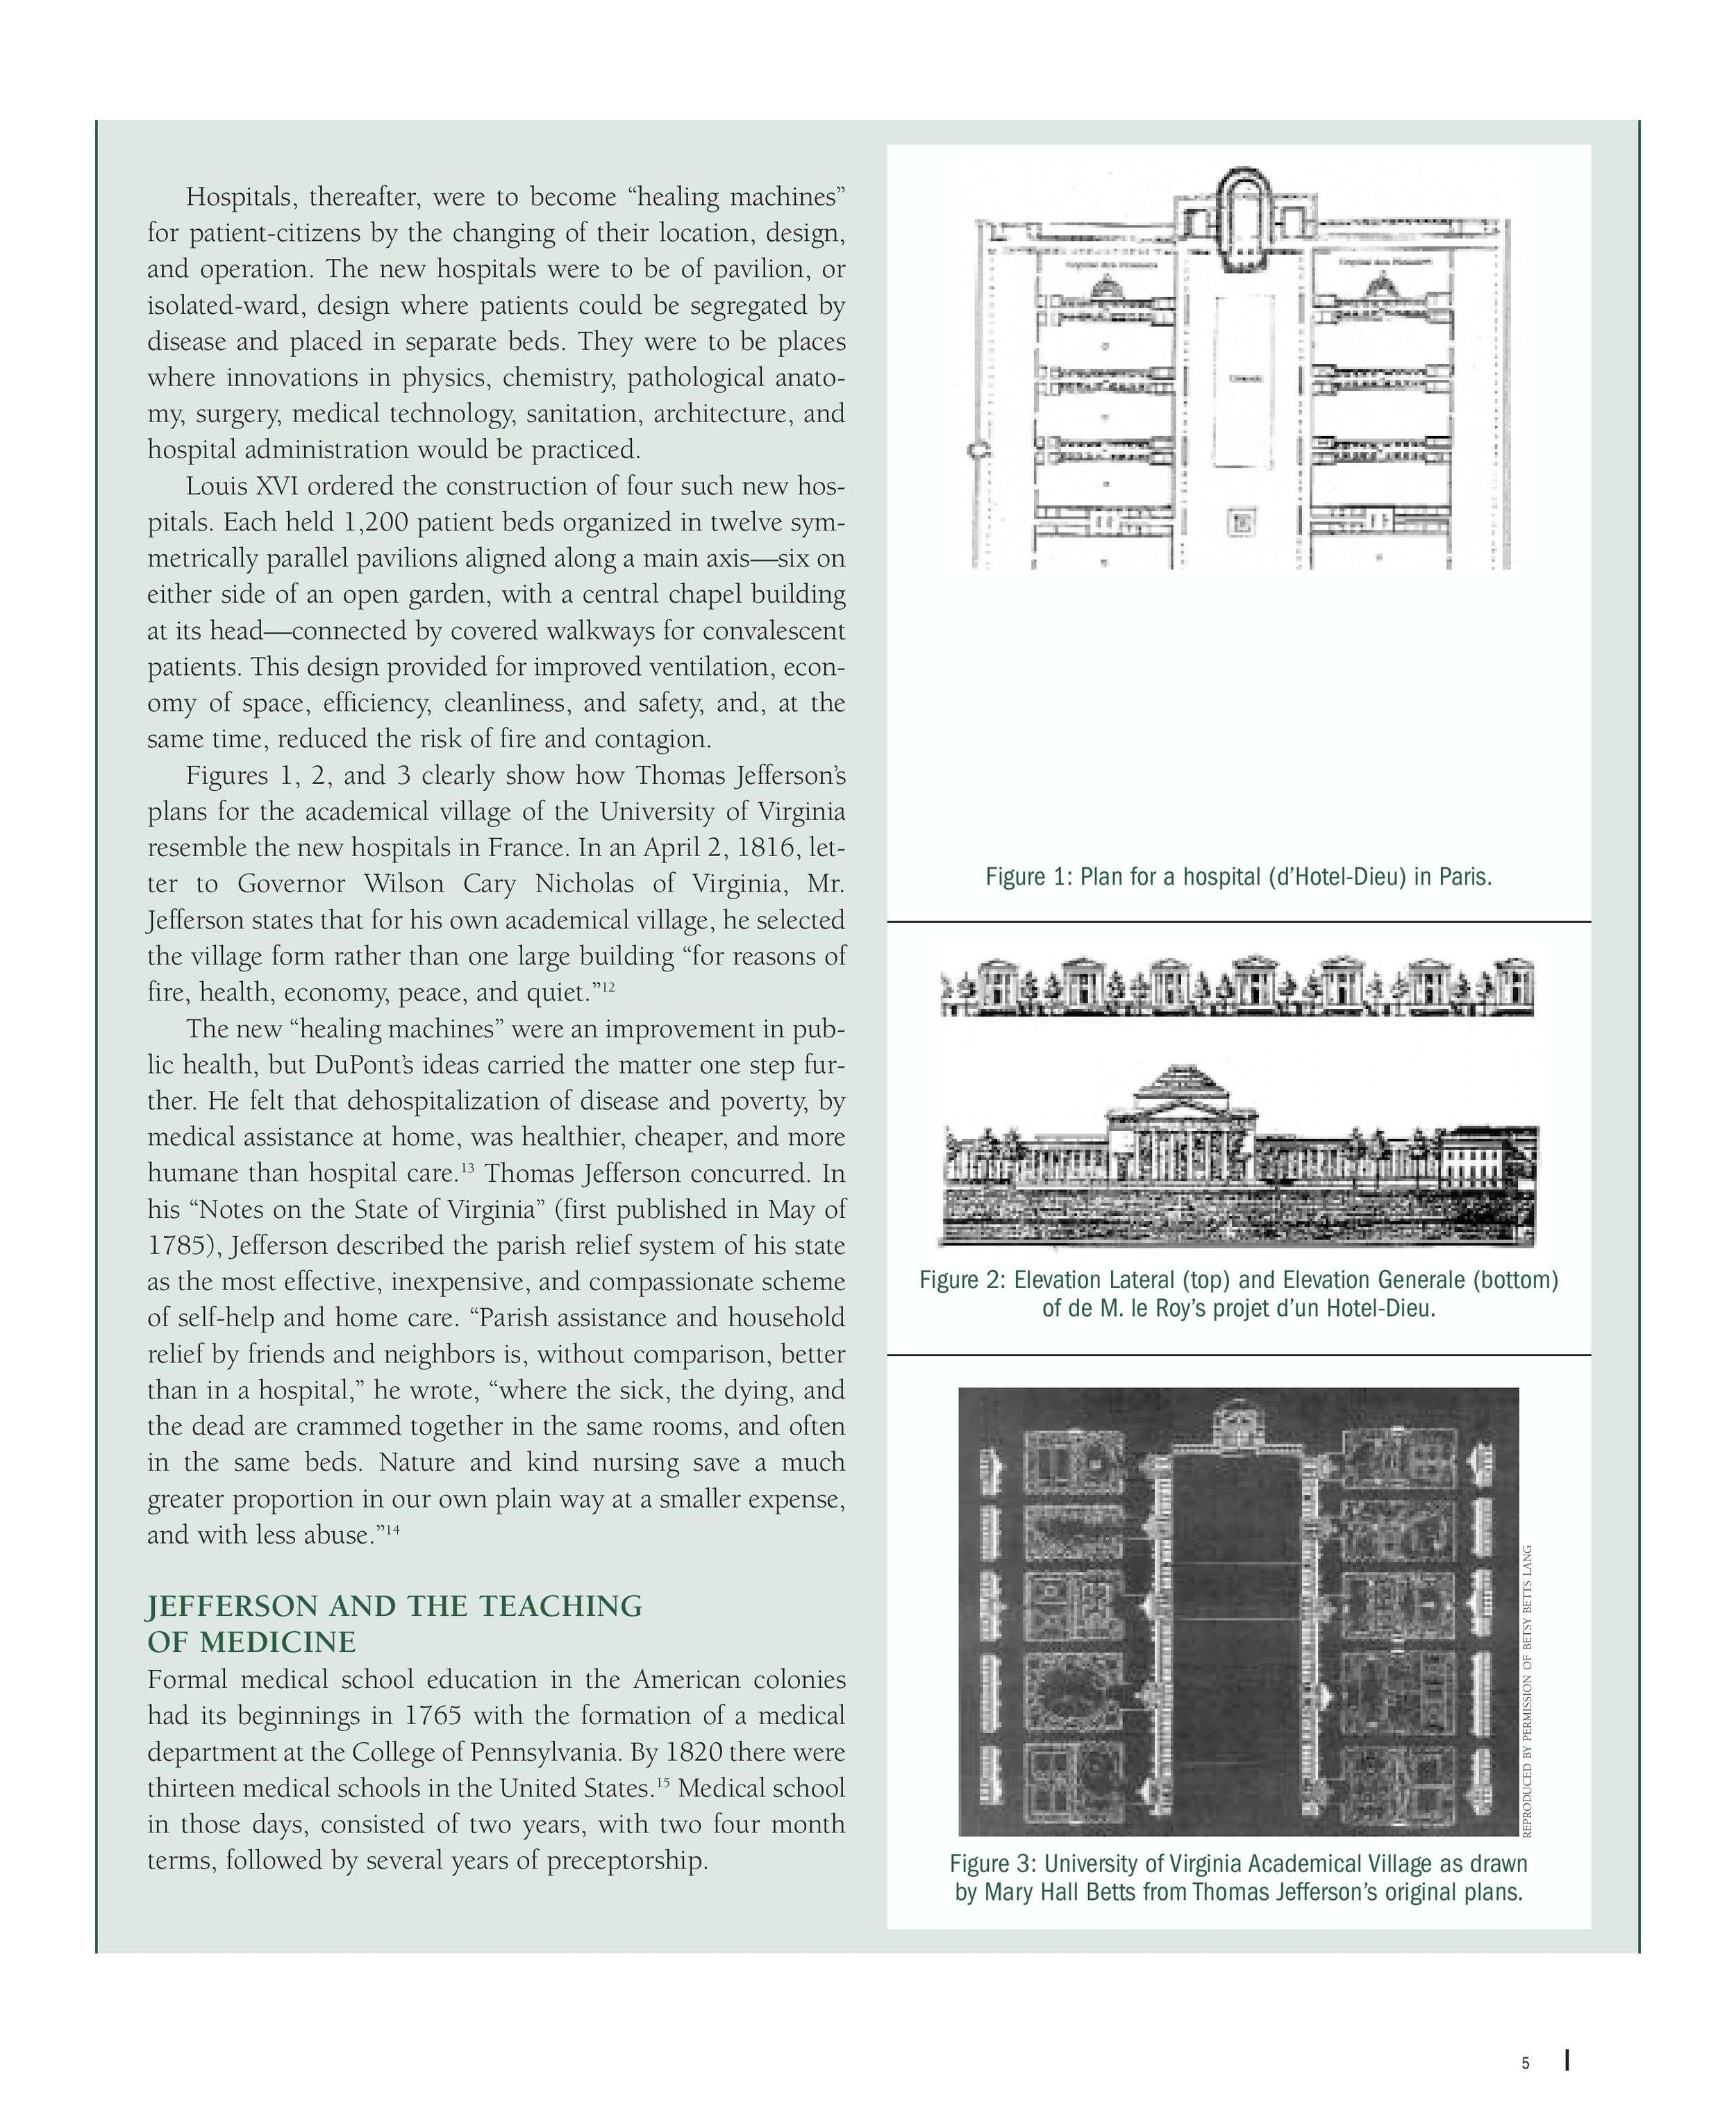 Jefferson_and_medicine-page-003.jpg